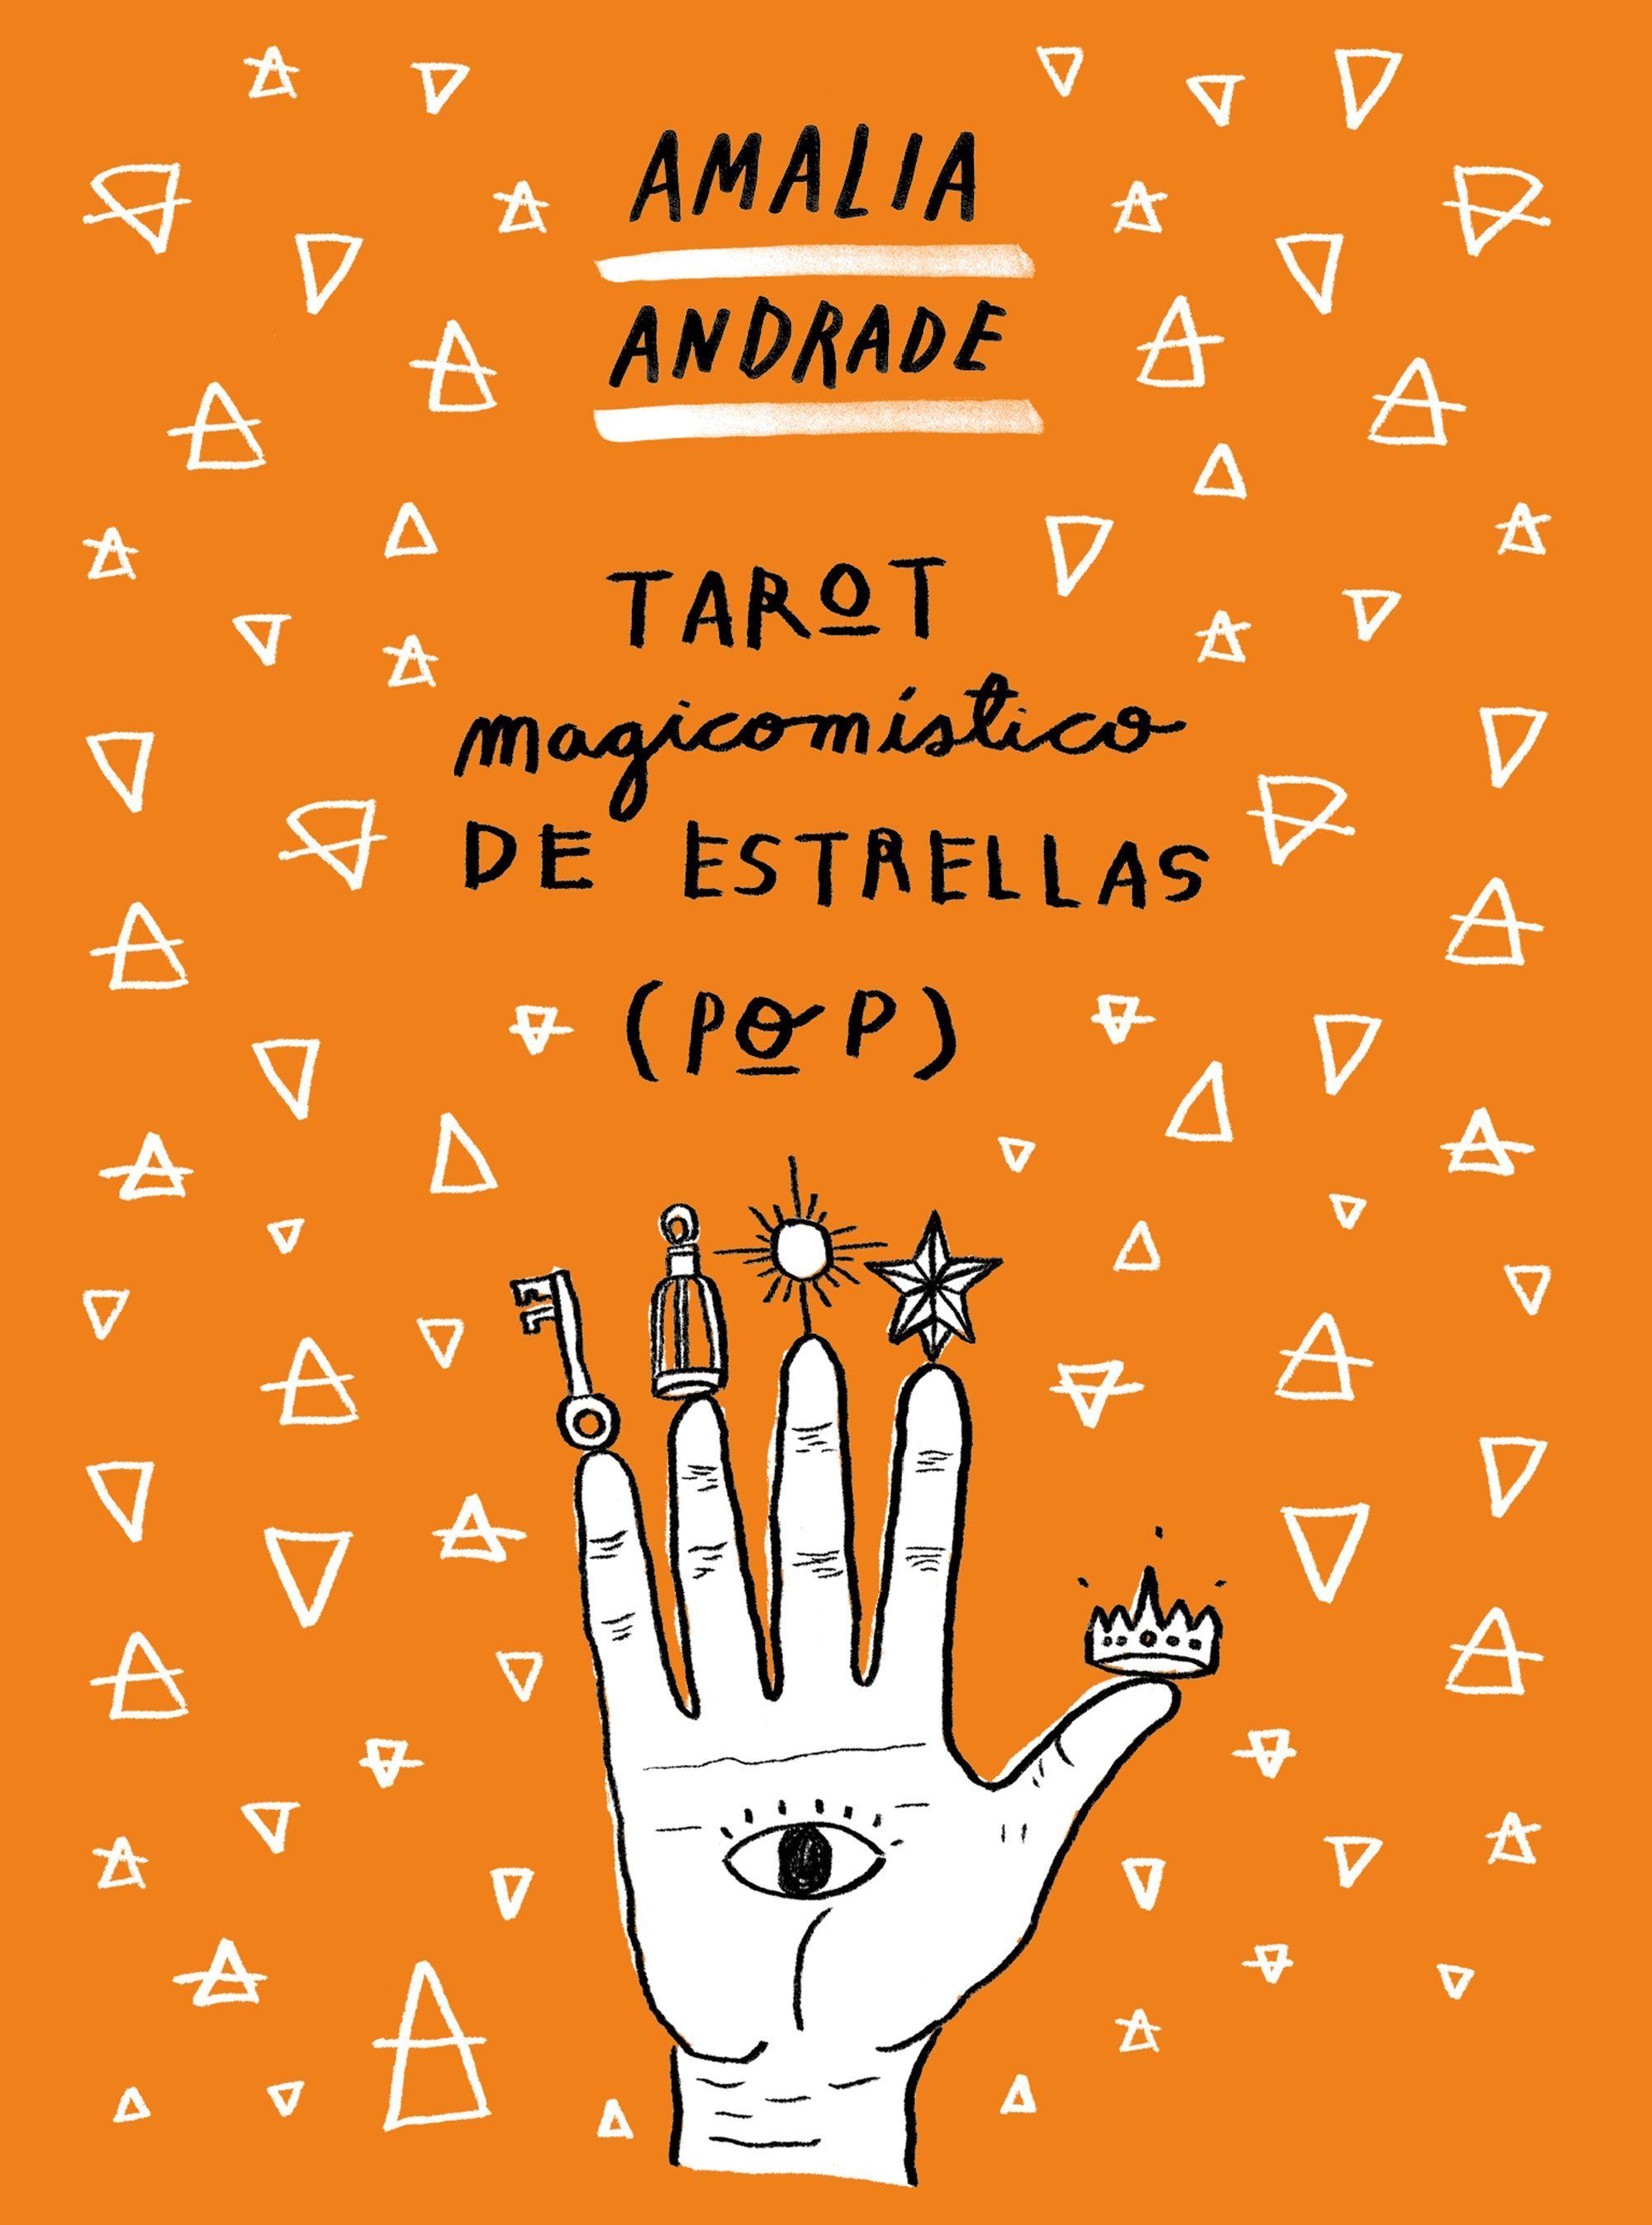 TAROT MAGICOMISTICO DE ESTRELLAS POP